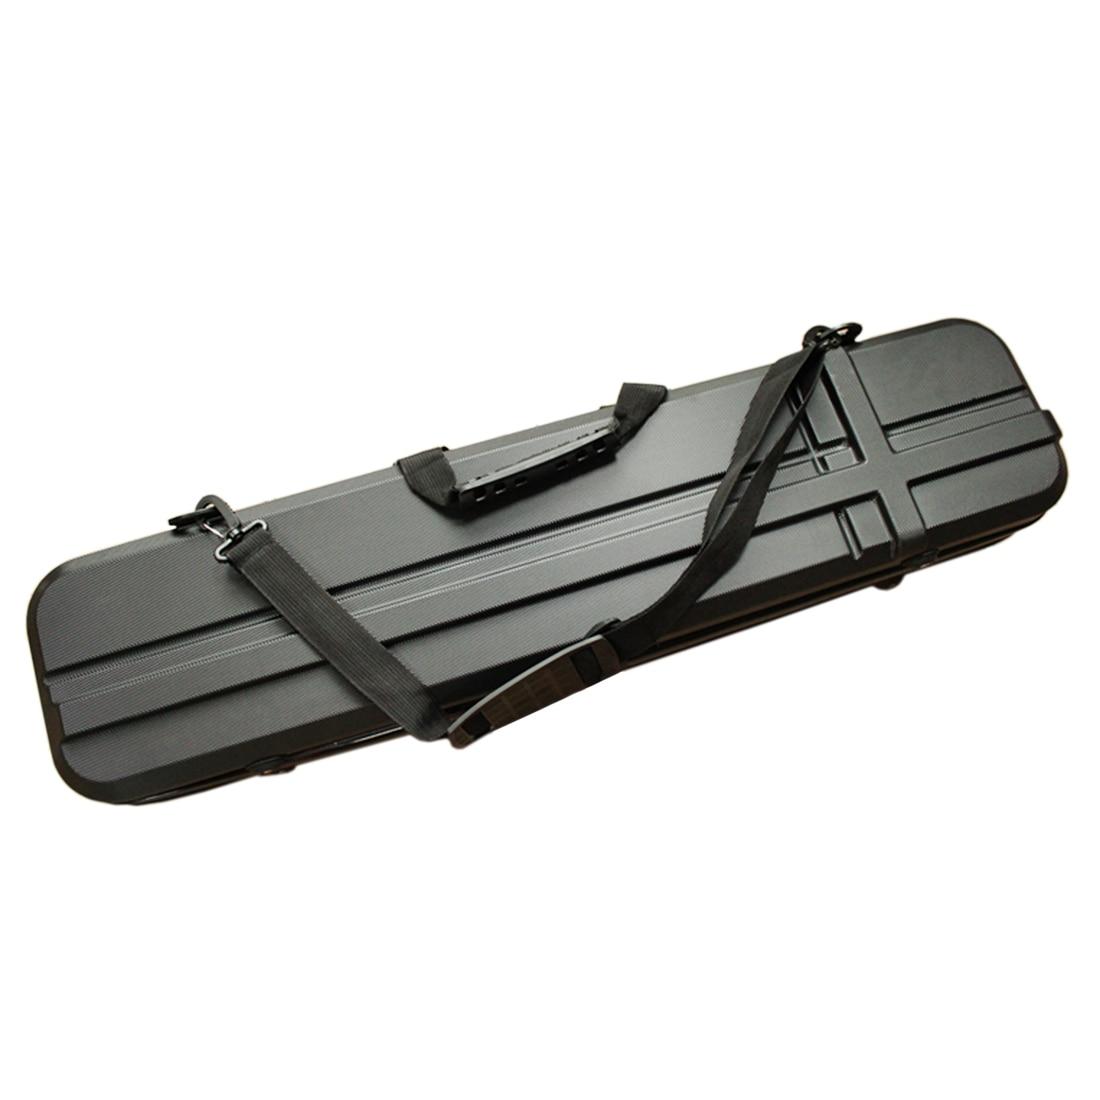 120cm×20cm×15cm Tactics Anti-knock Case Long Storage Carry Box